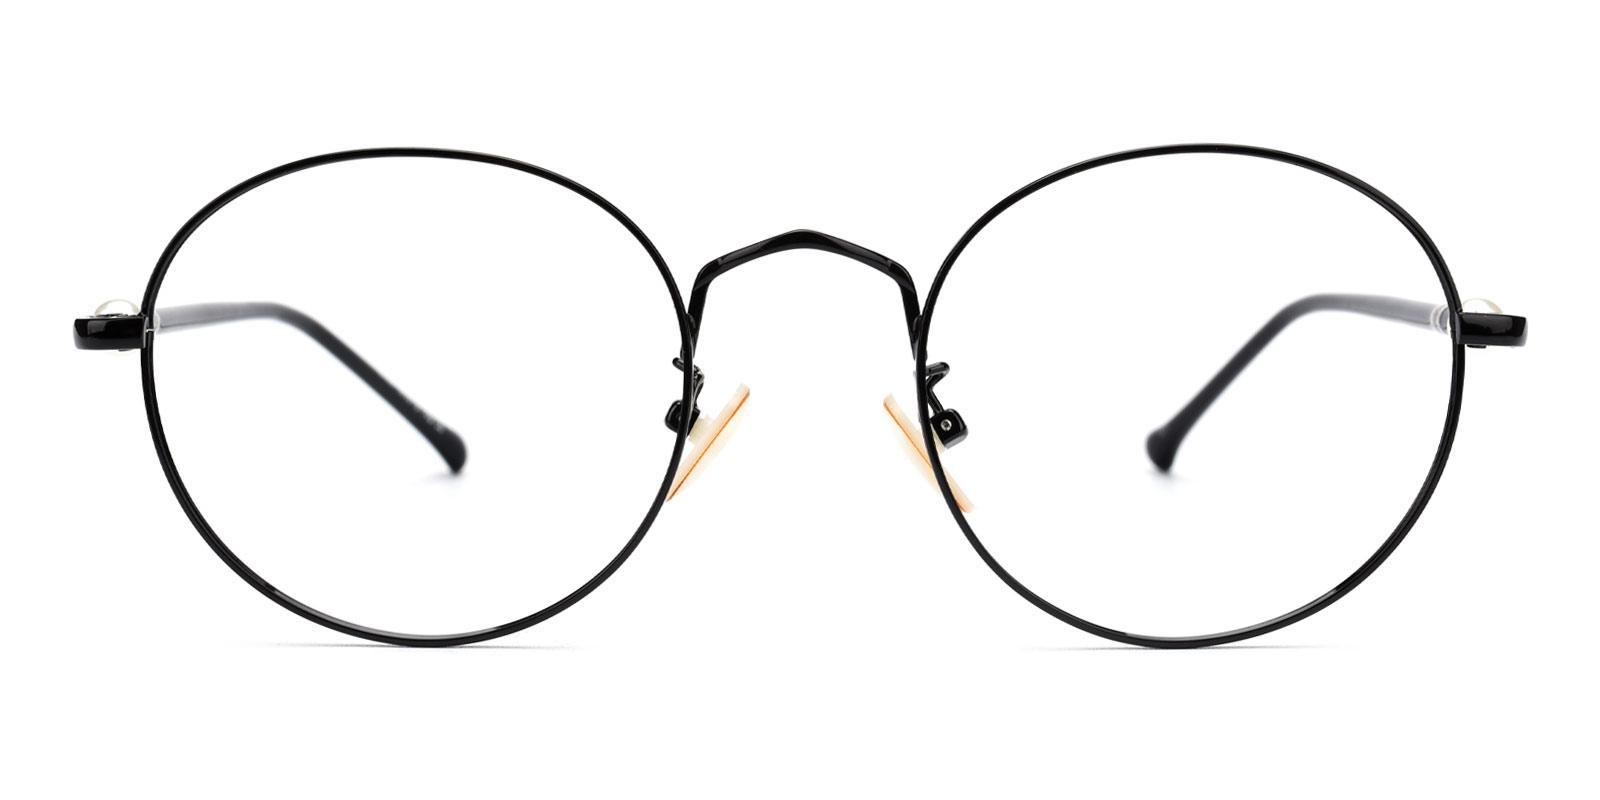 Oswego-Black-Round-Metal-Eyeglasses-additional2